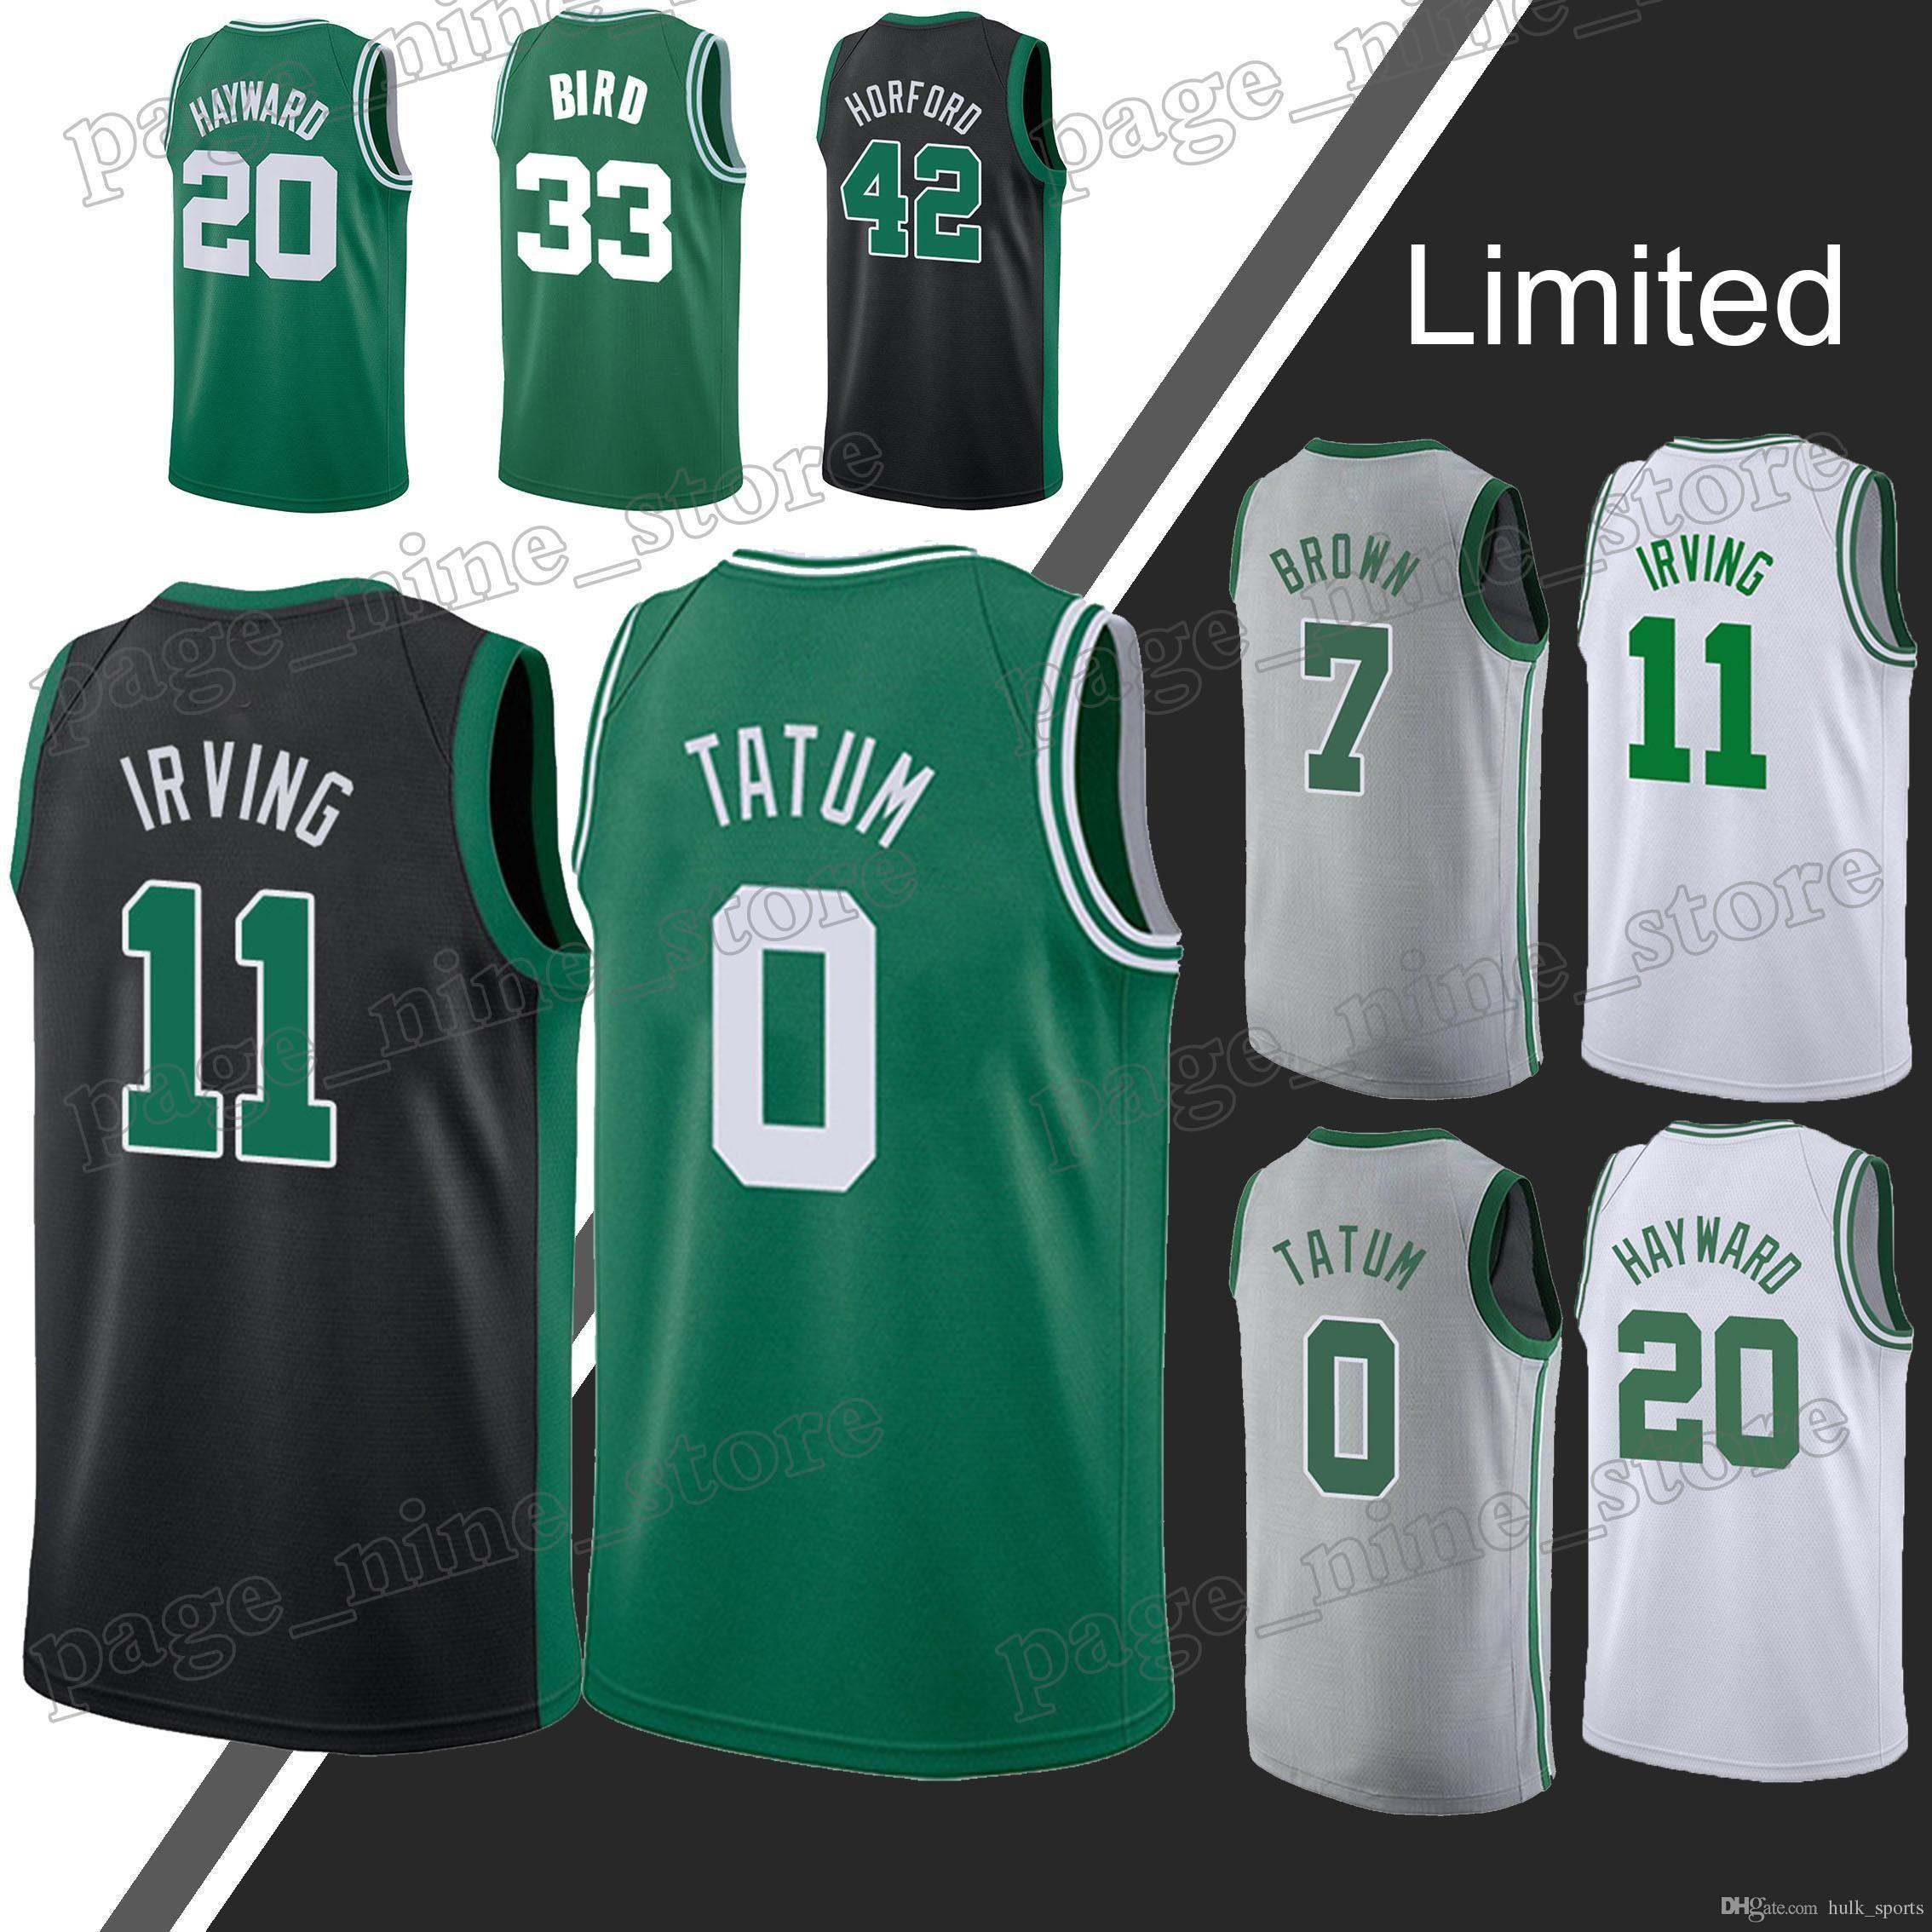 new styles 59137 1231d Boston jerseys Celtic Jayson 0 Tatum jersey 11 Irving Larry 33 Bird Gordon  20 Hayward jerseys